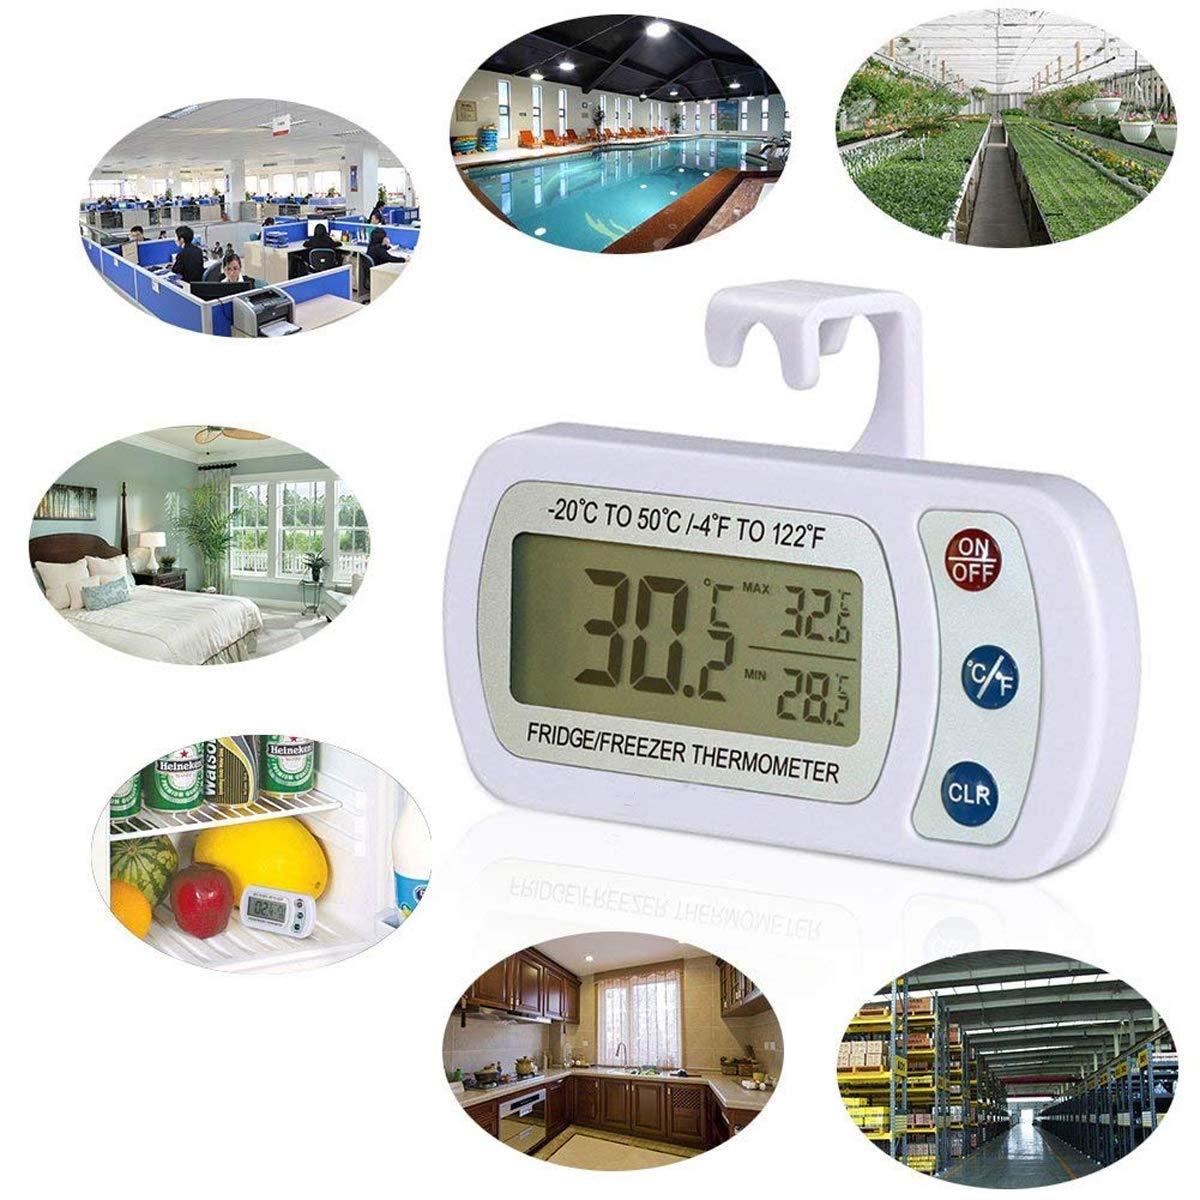 AIGUMI Term/ómetro Digital congelador Impermeable con Pantalla LCD y Easytoread MAX min 2PackWhite